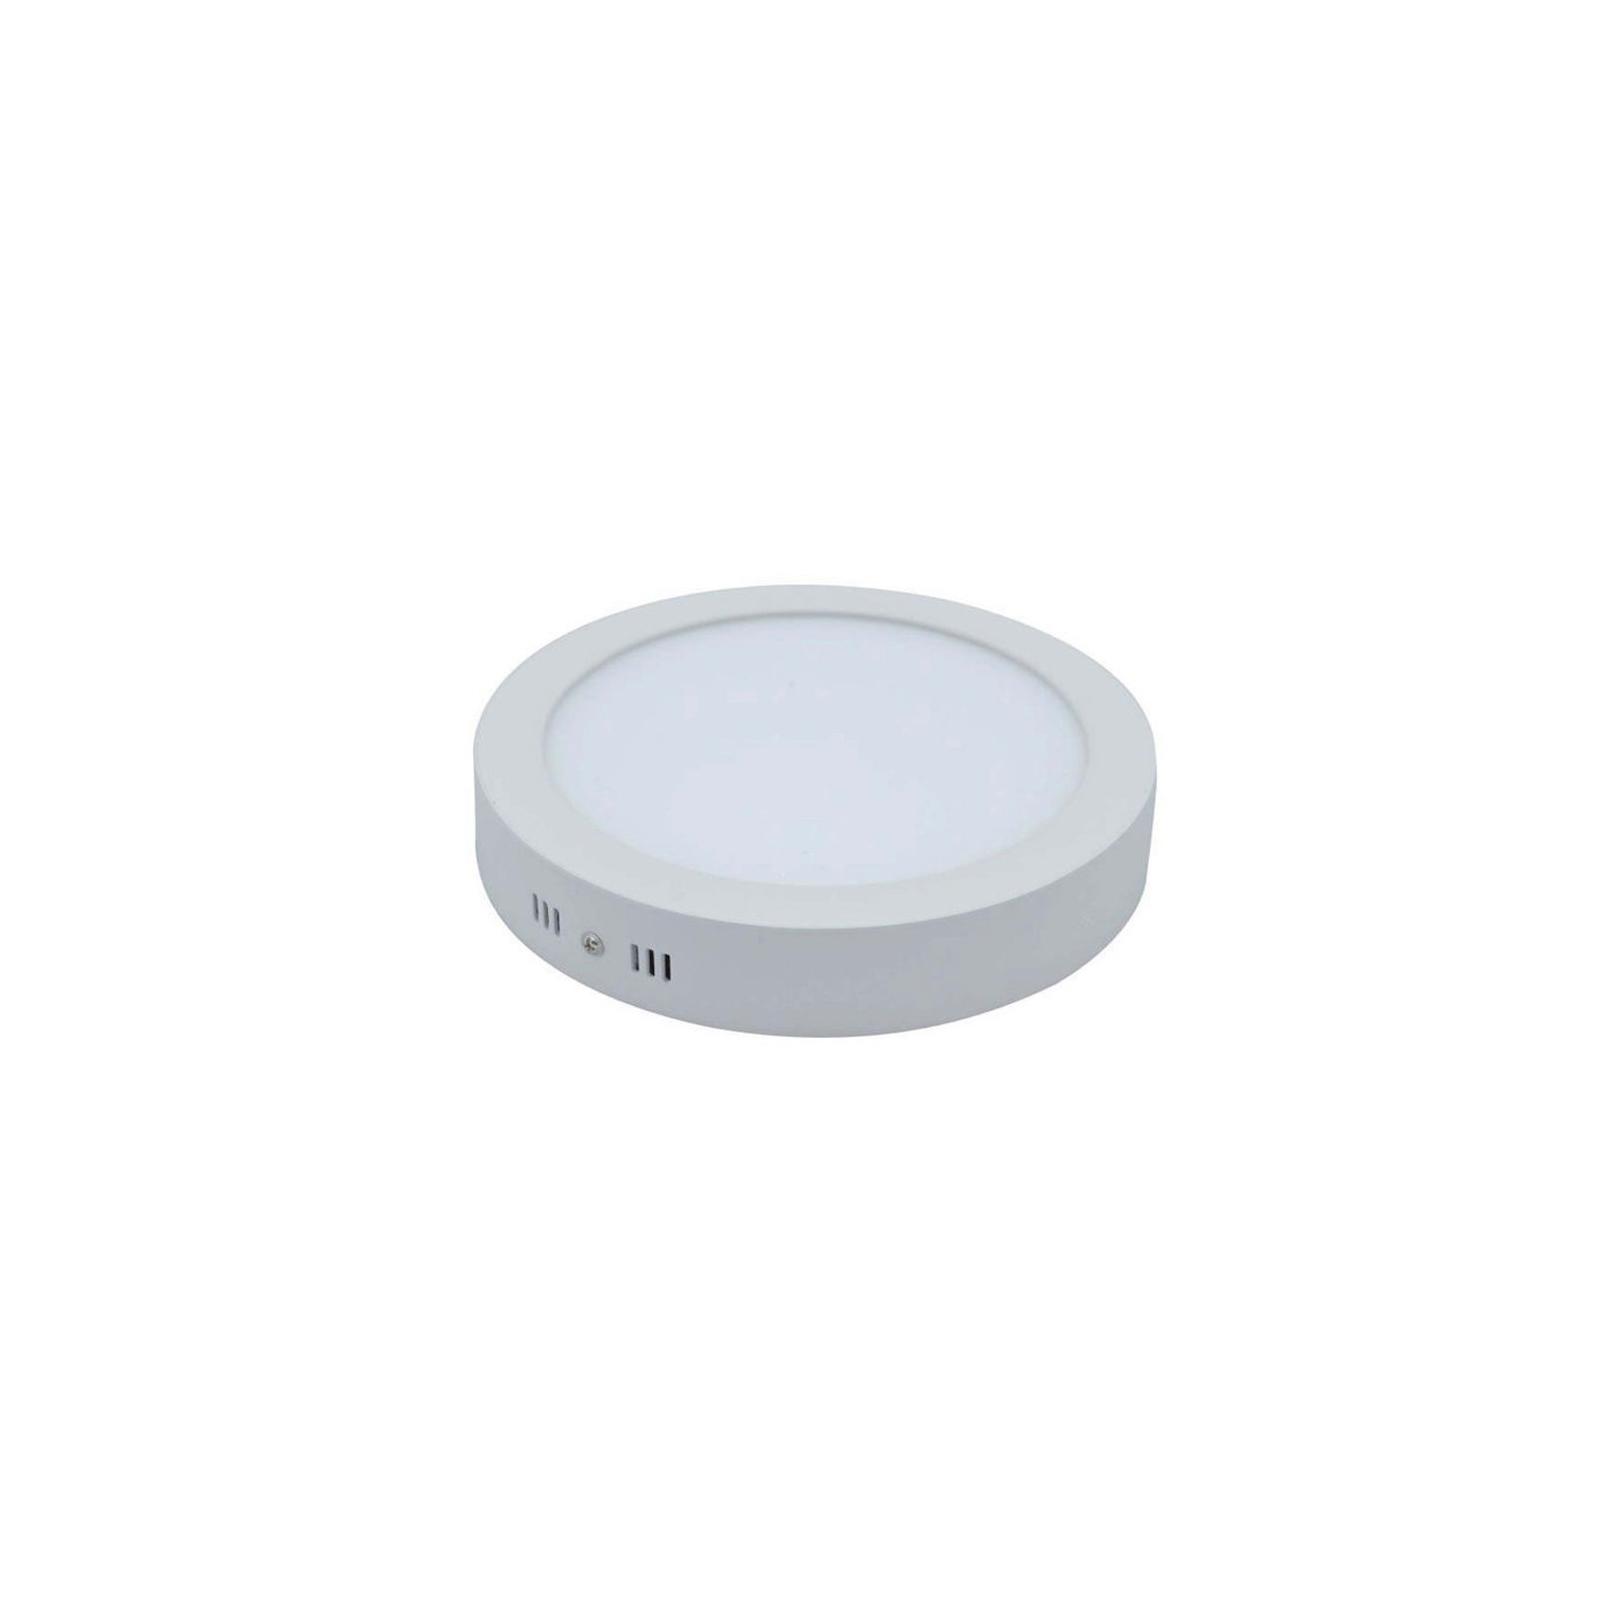 HUBLOT LED 12W ROND BLANC CHAUD INTERIEUR IP20